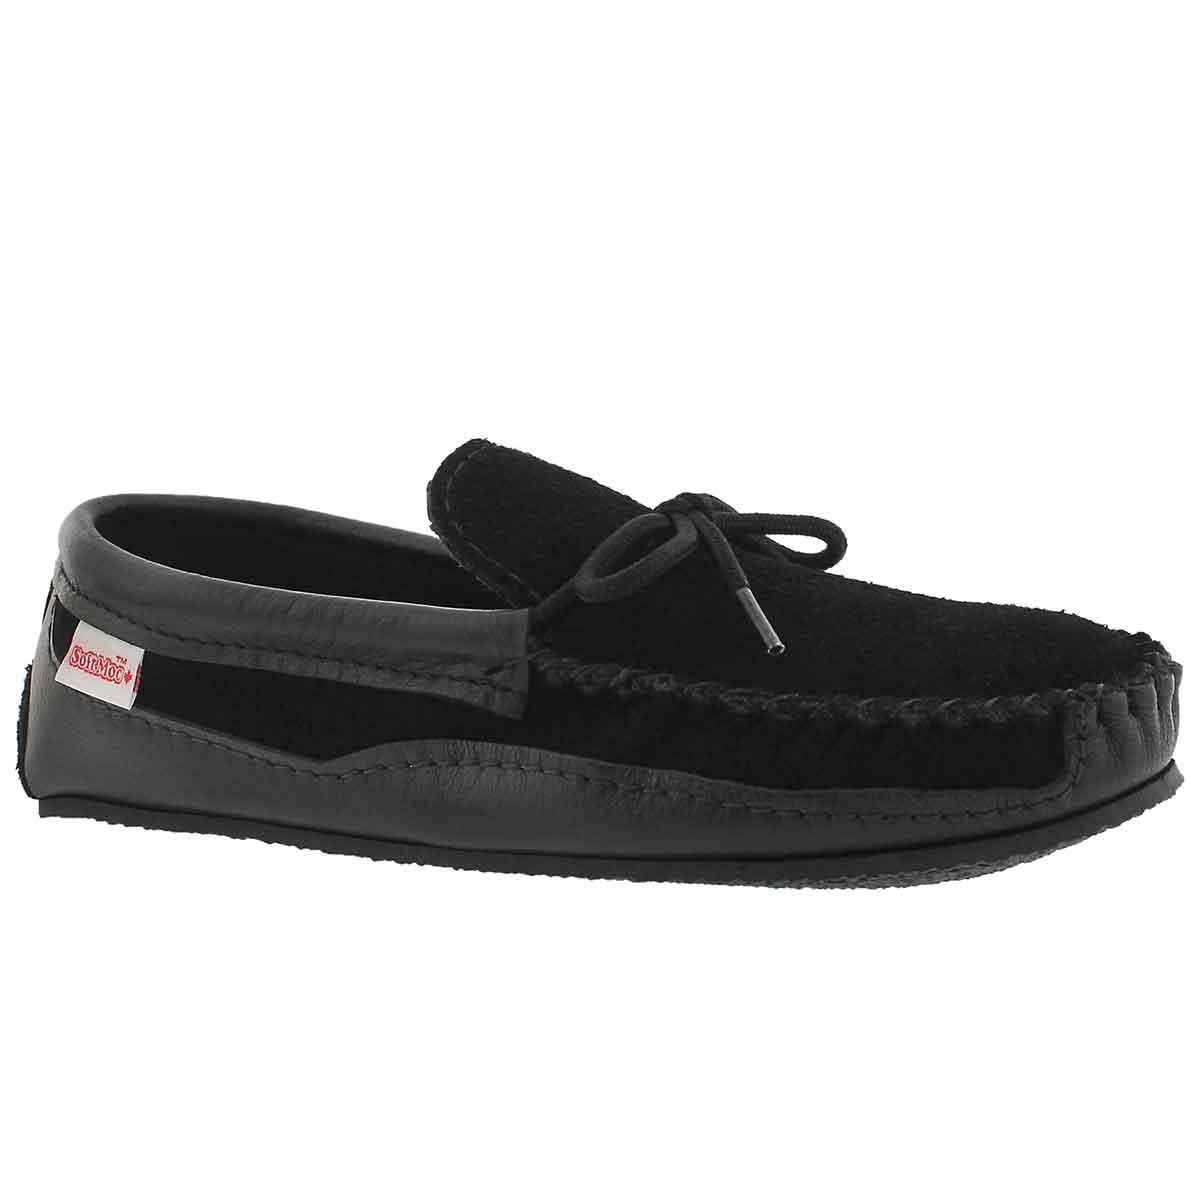 Men's black crepe sole w/memory foam moccasins